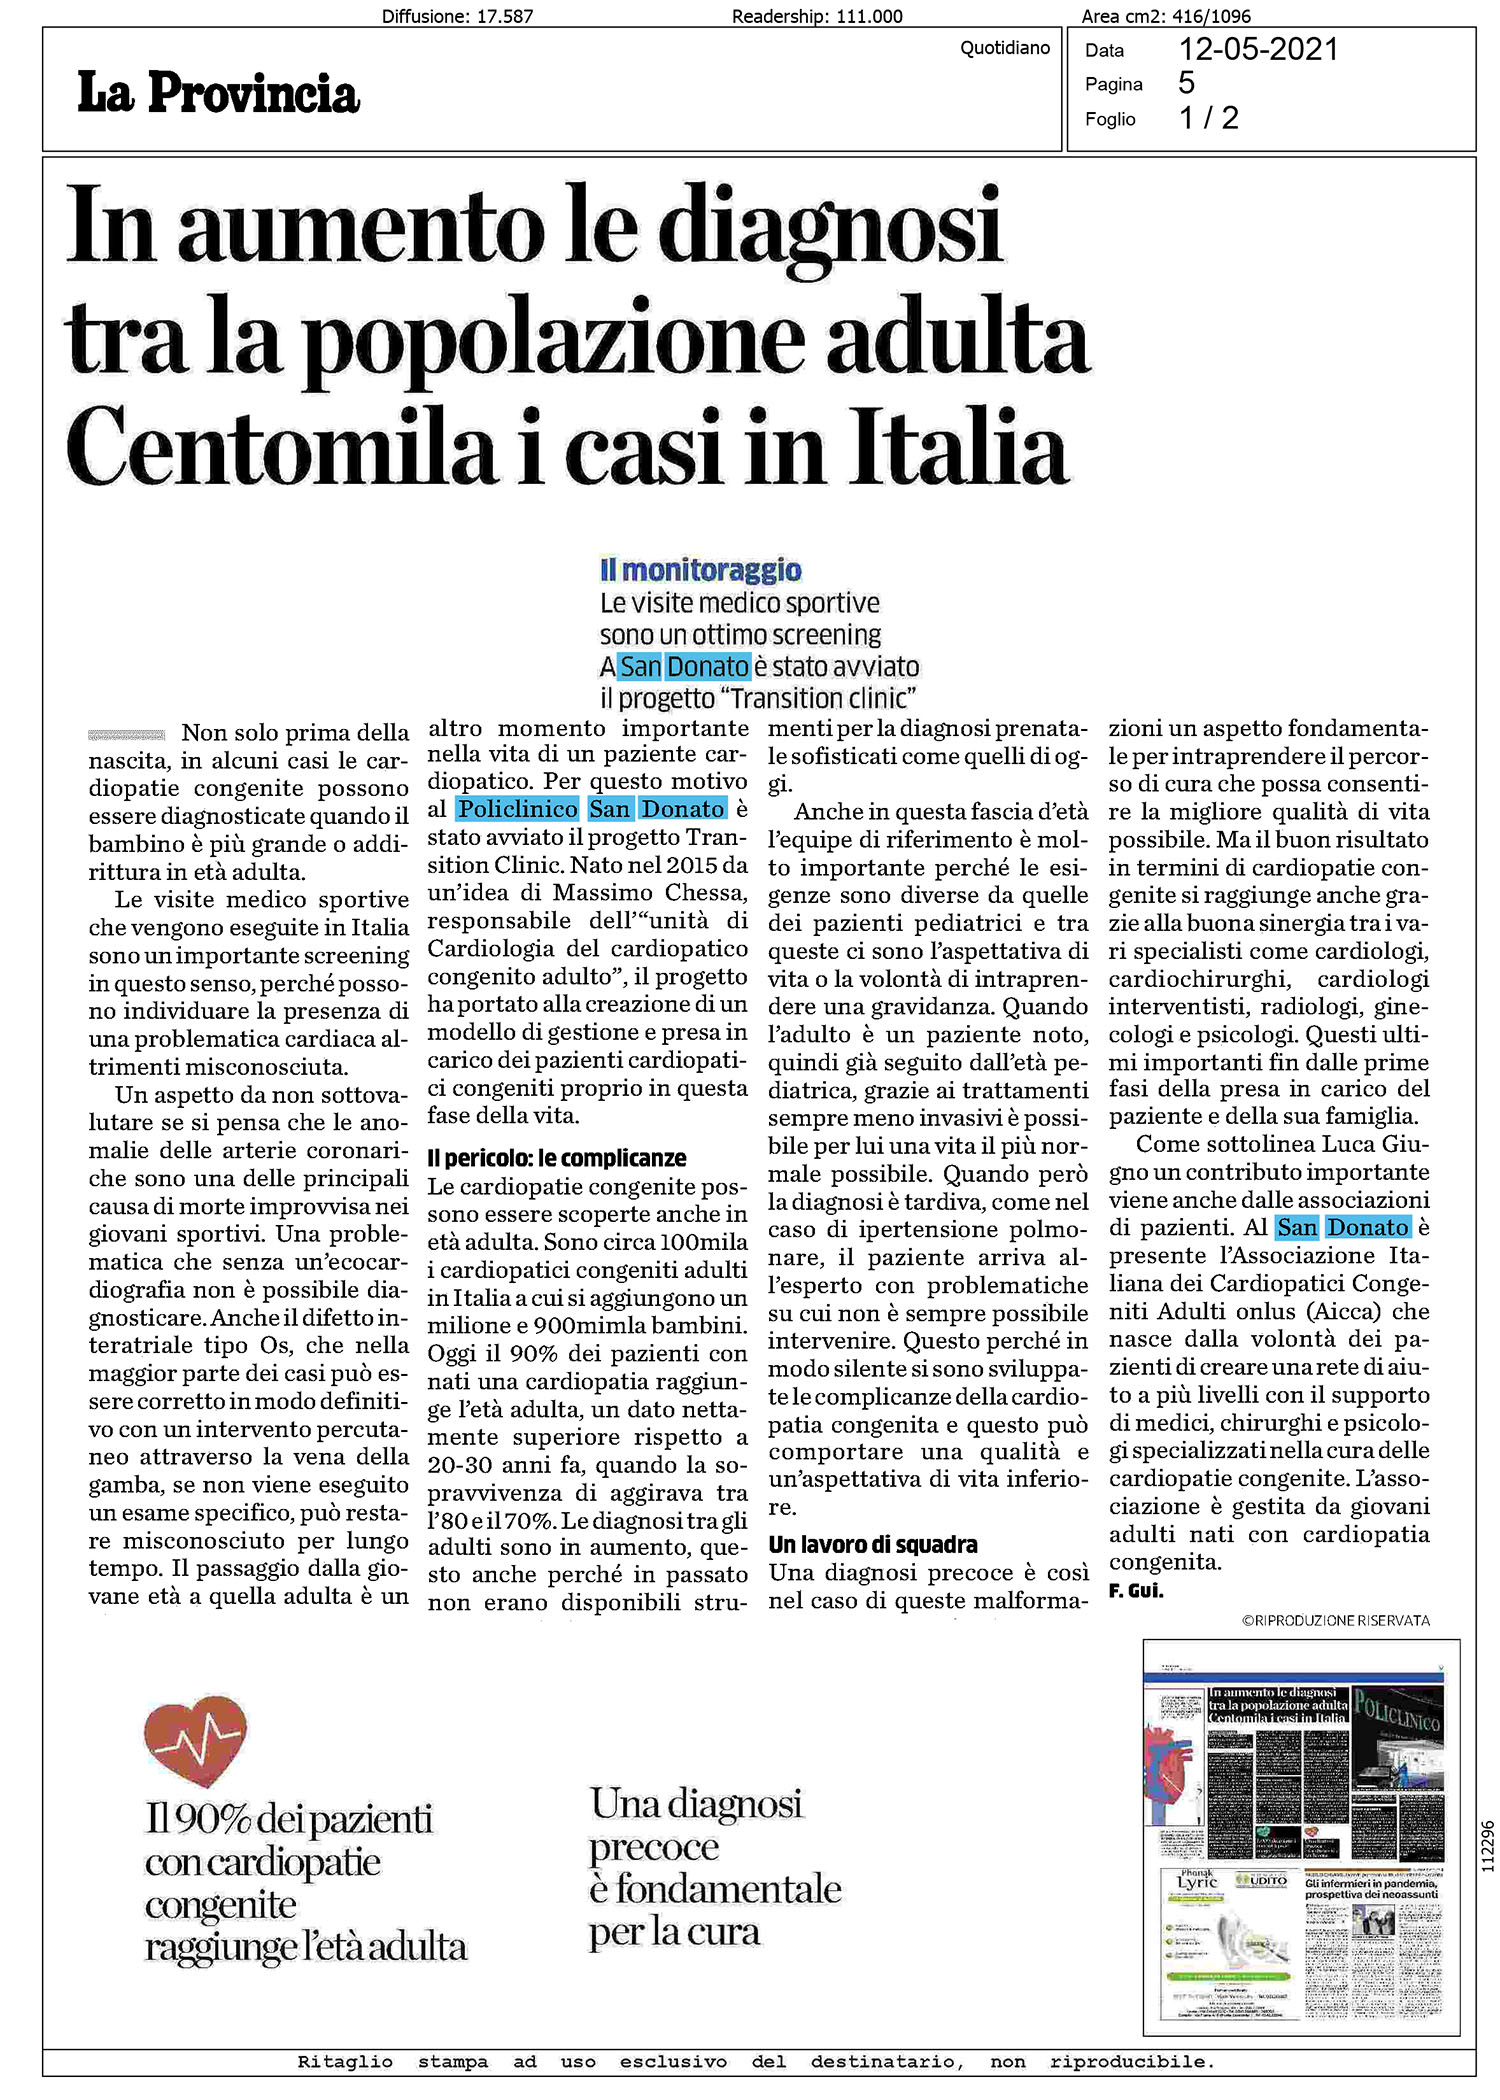 Diagnosi San Donato